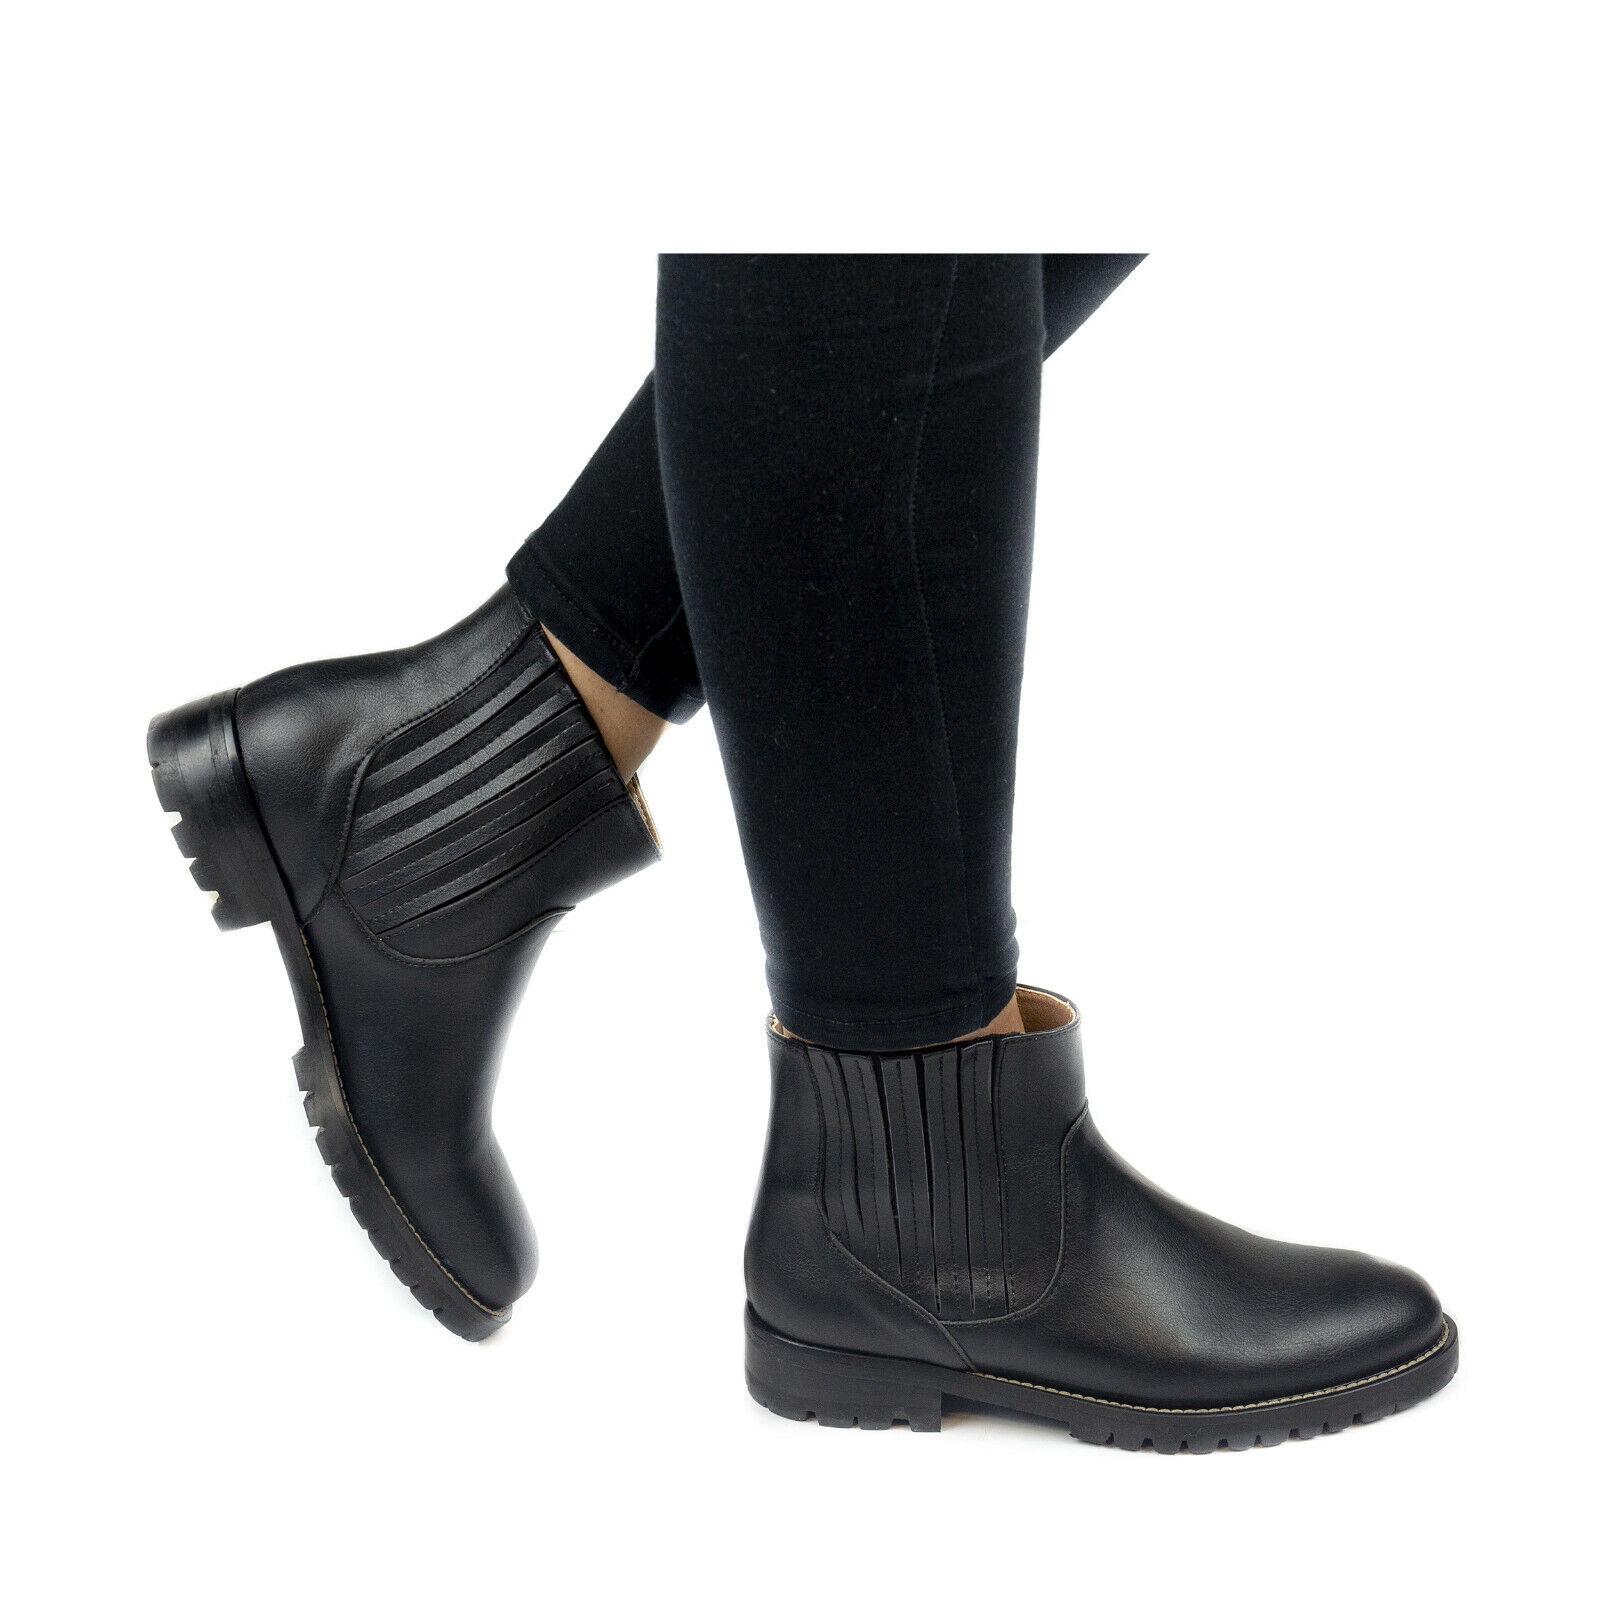 Woman Vegan Ankle Boot Chelsea Round-Toe Flat Heel Anti-Skid Lugged Elastic Side 1